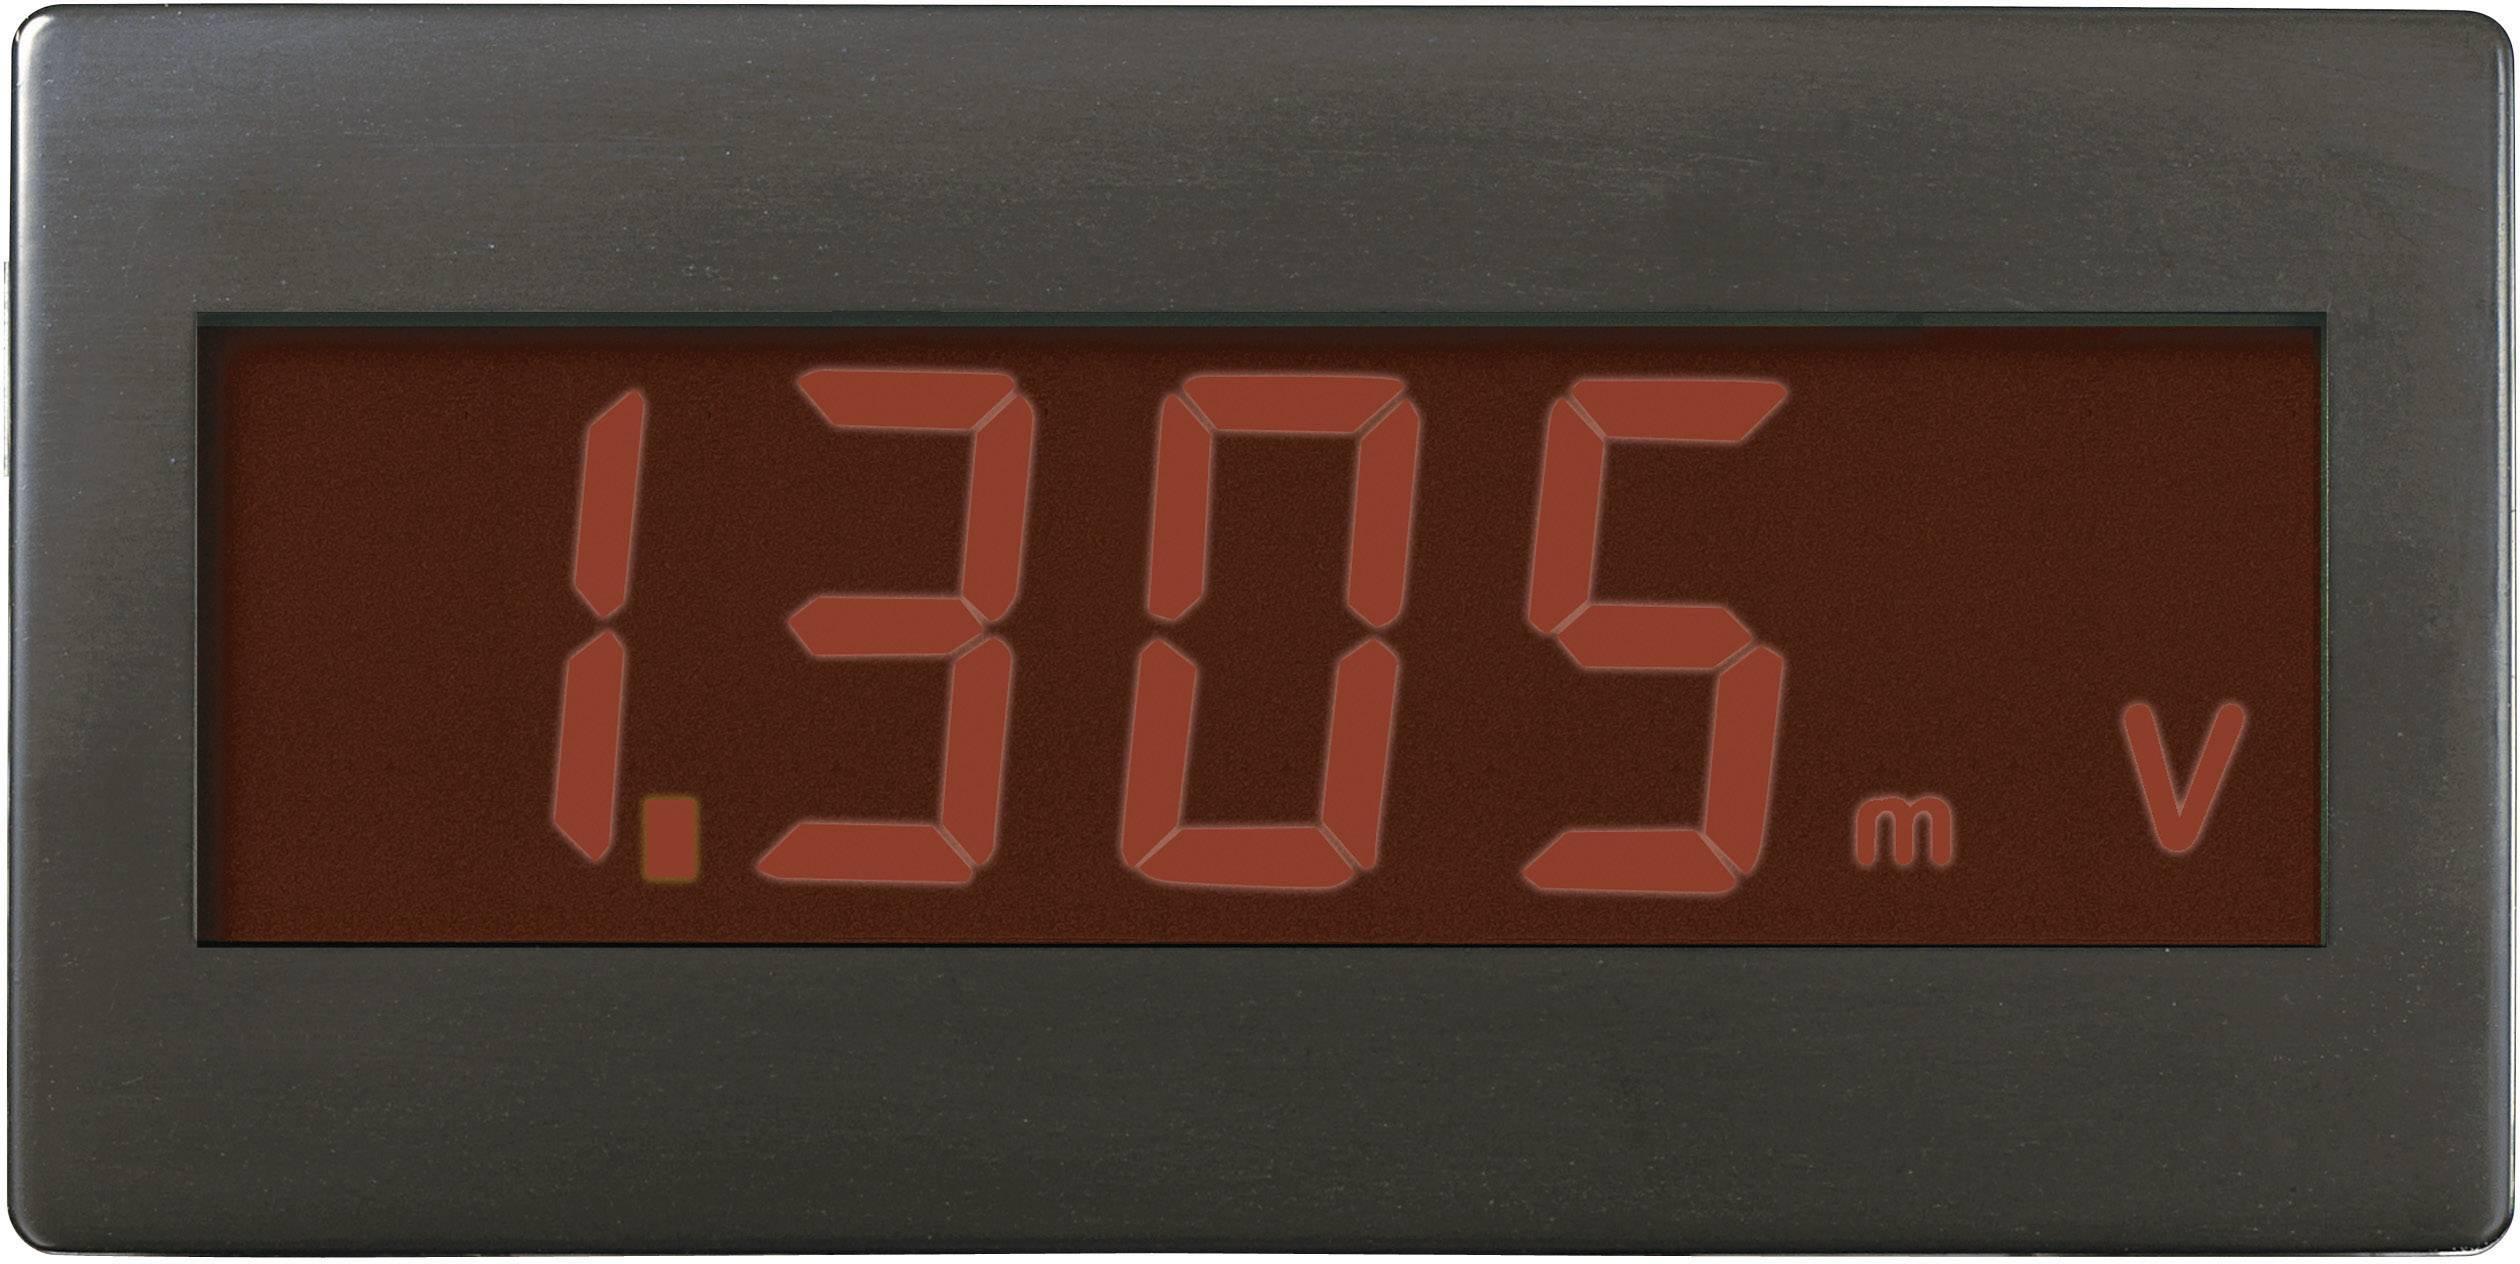 Digitálne panelové meradlo Voltcraft DVM-330RN, 68 x 33